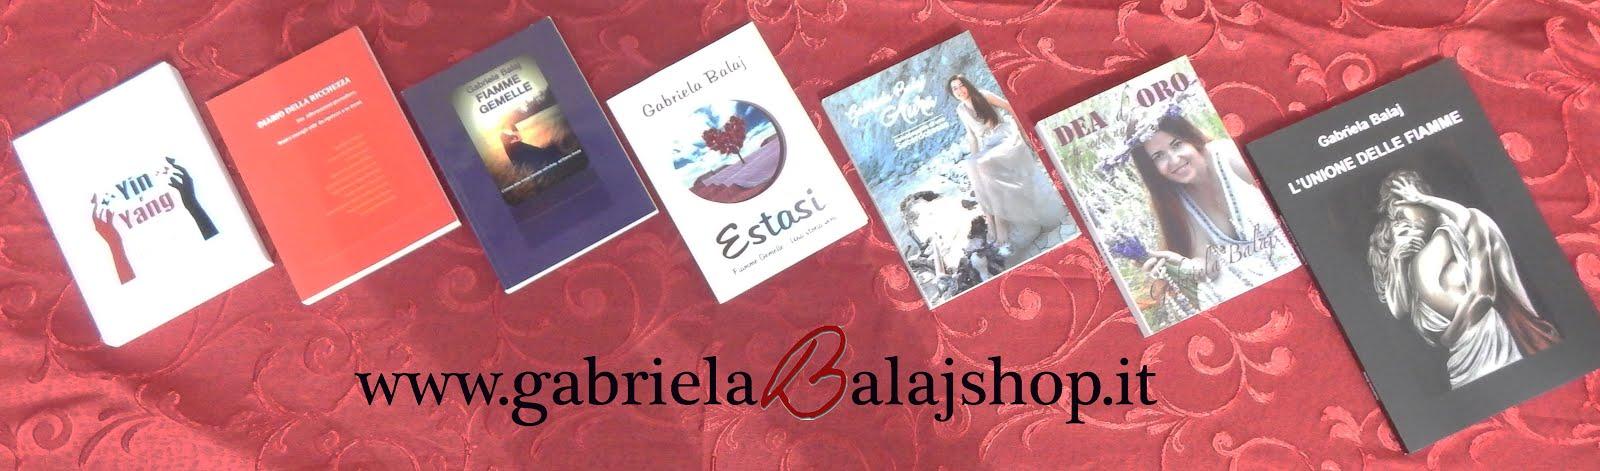 "Autrice di 7 libri tra cui ""Aura.Autobiografia di una Sacerdotessa"", ""Fiamme Gemelle""e vari e-book"